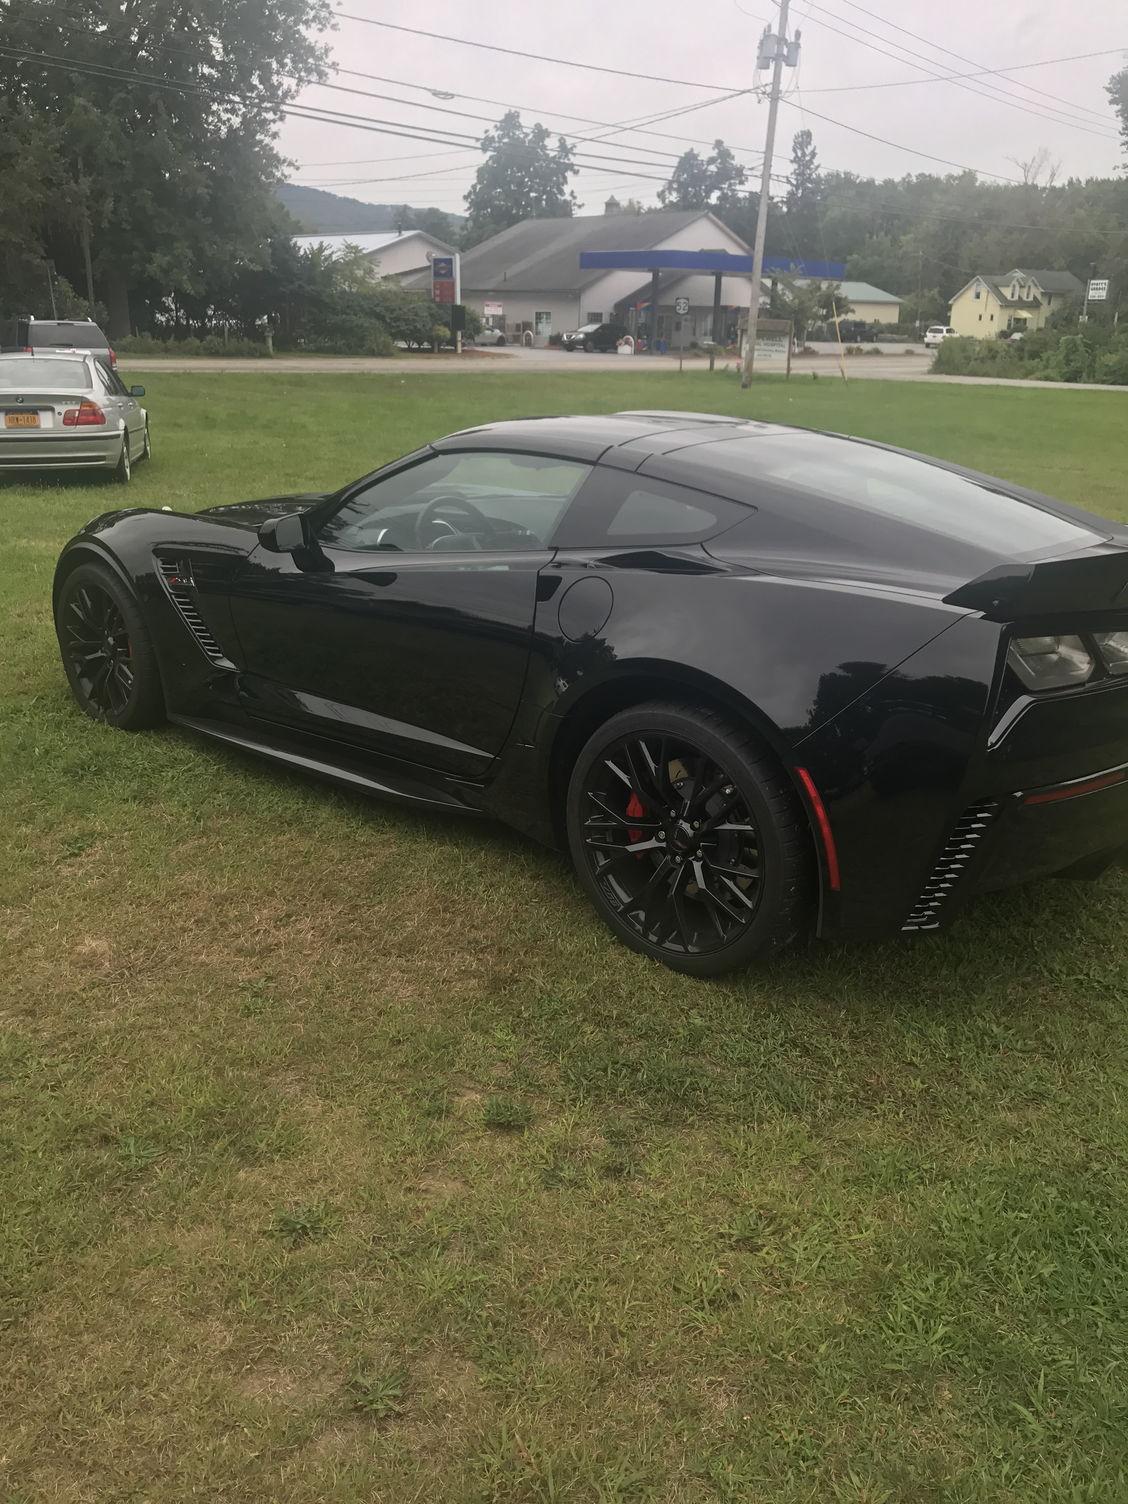 fs for sale 2017 corvette zo6 a8 mo lease takeover corvetteforum chevrolet. Black Bedroom Furniture Sets. Home Design Ideas